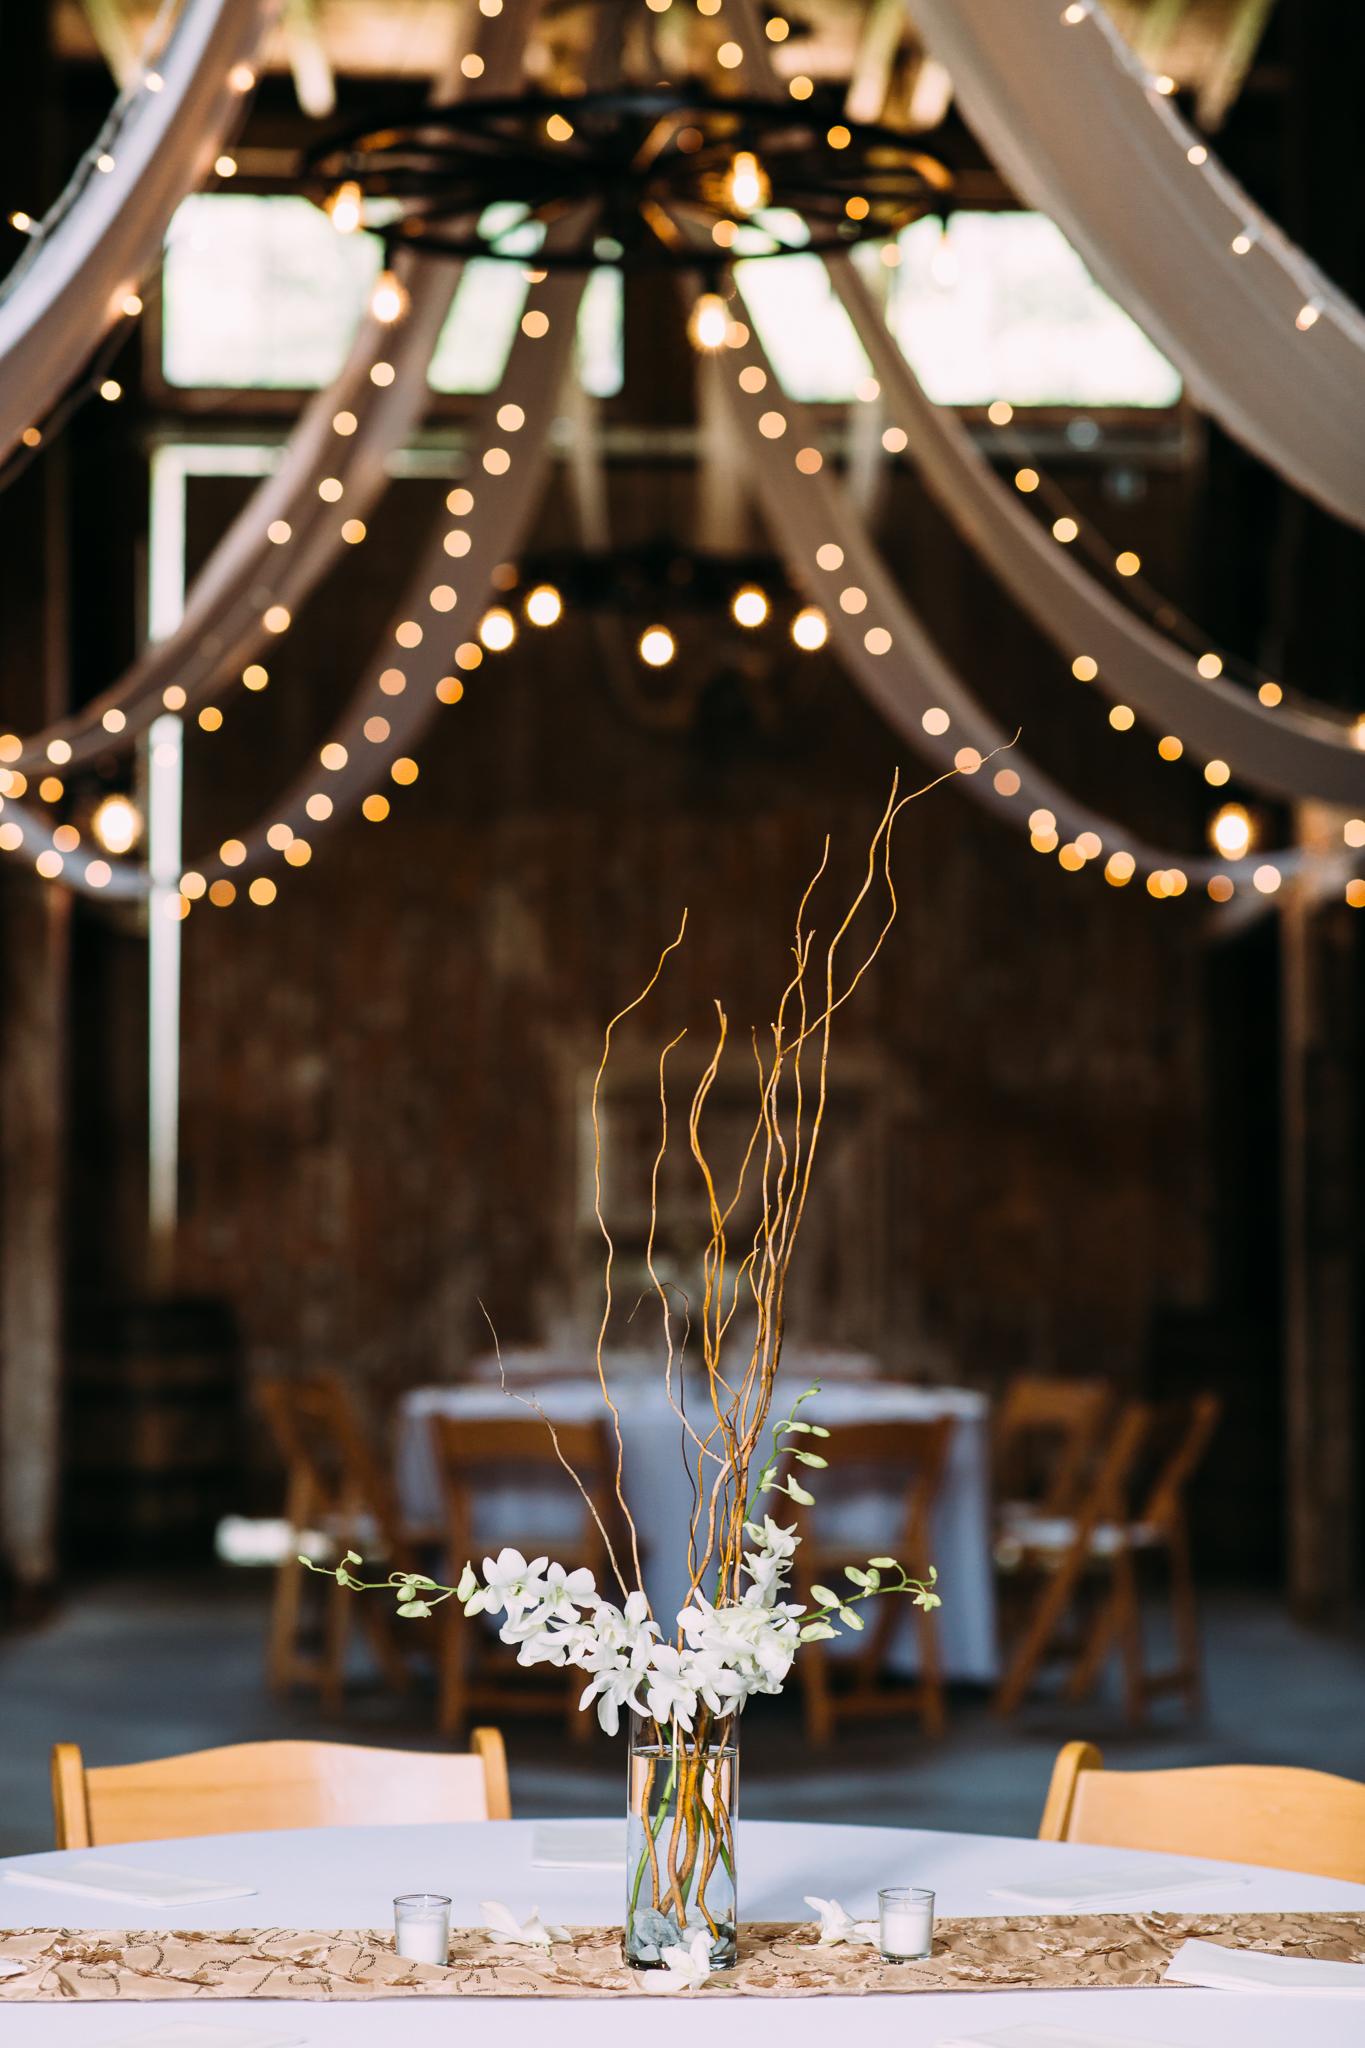 a-barn-wedding-venue-details-dayton-maine-portland-waterville-central-maine-photographer.jpg